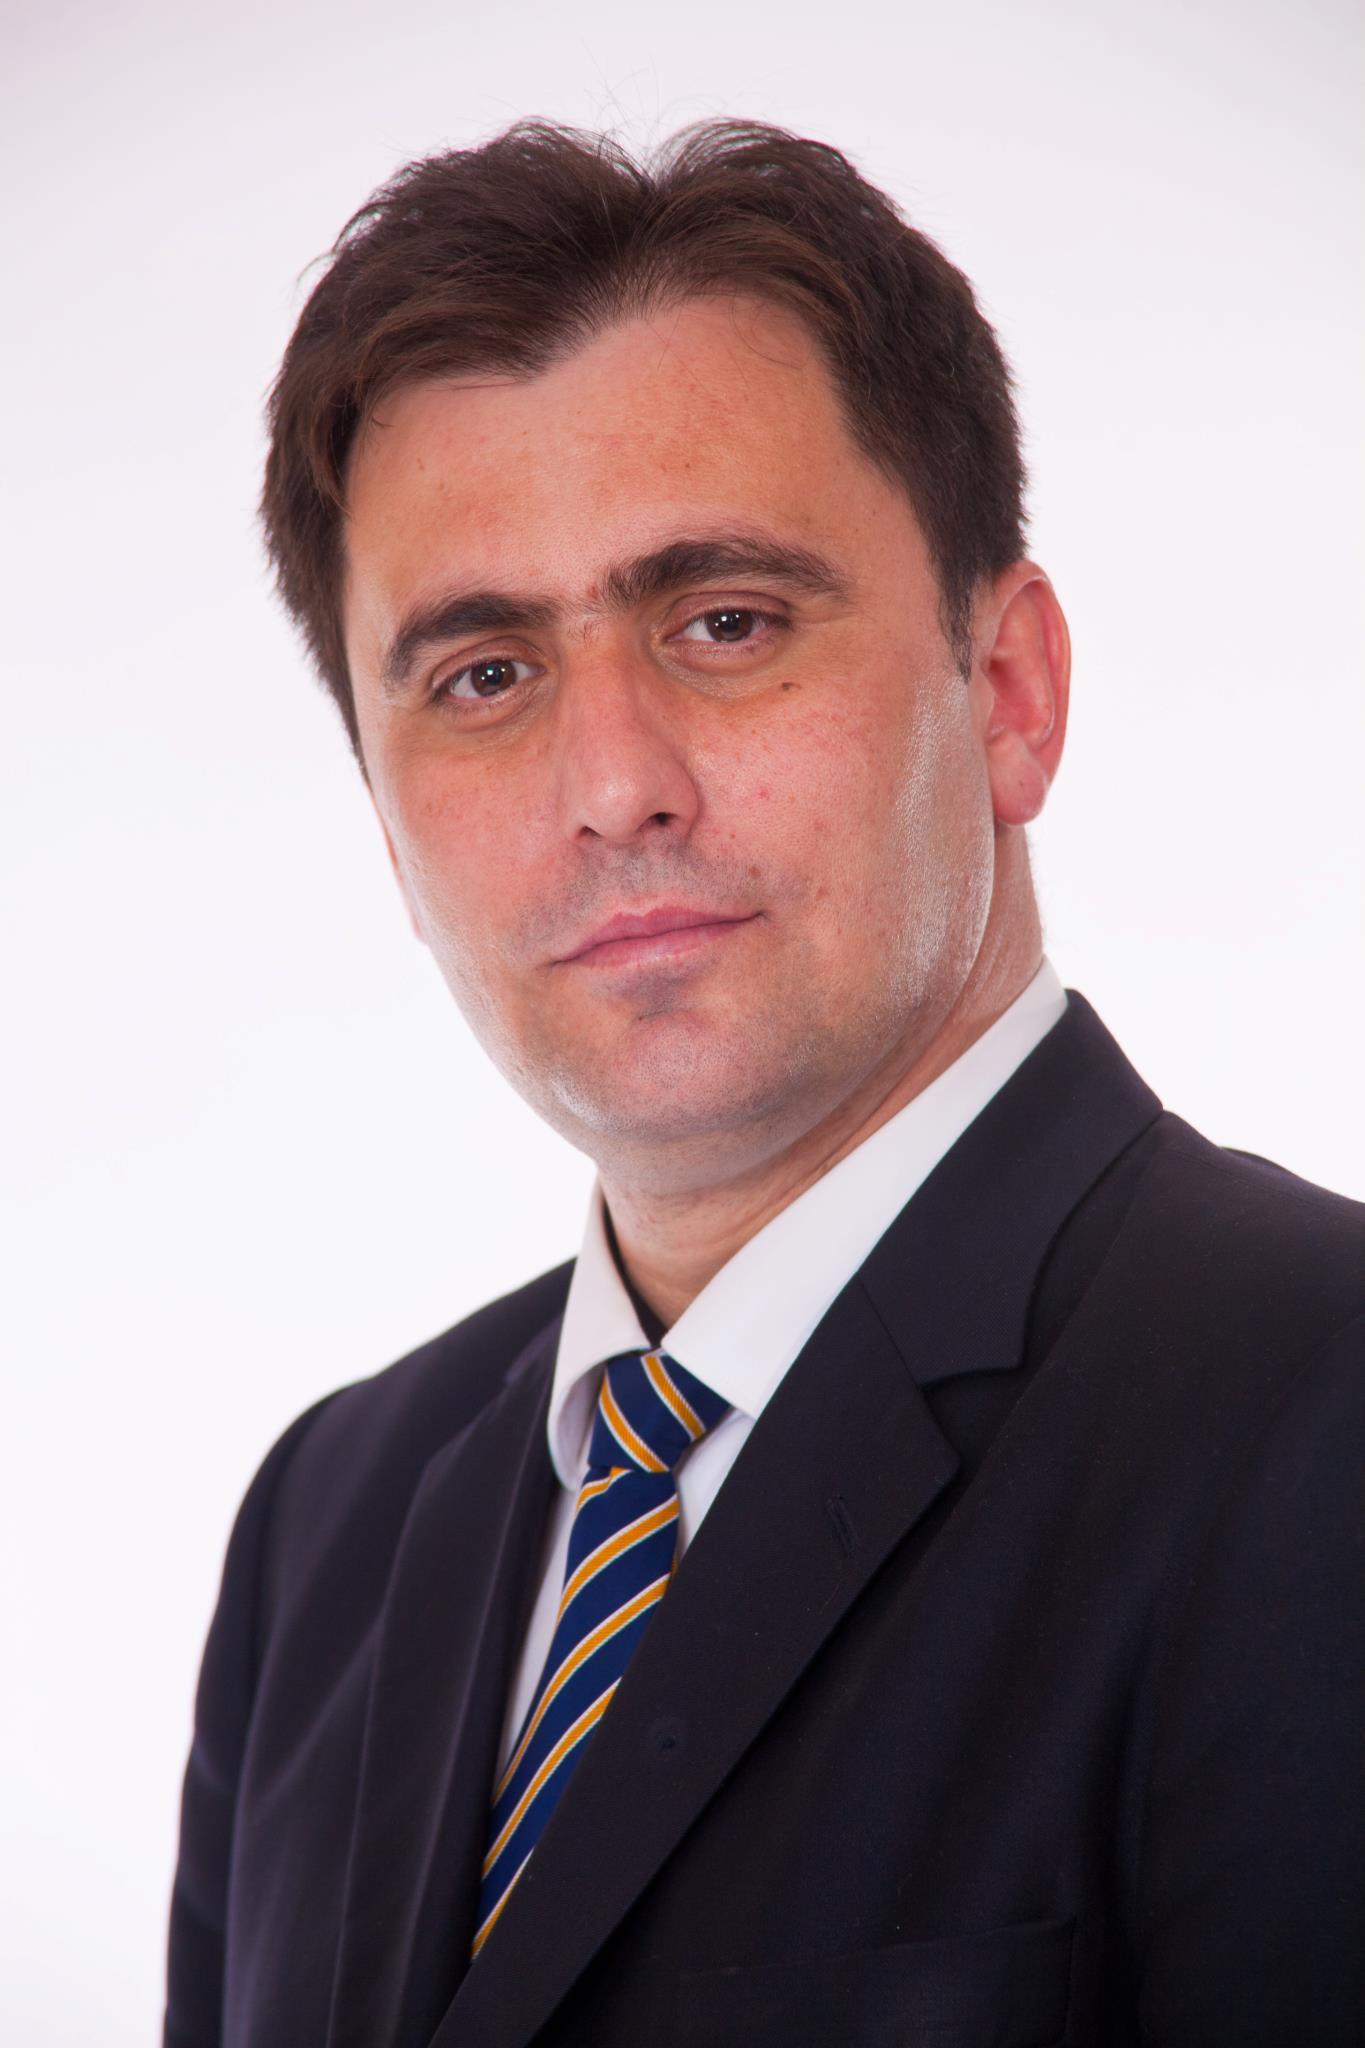 Ioan Cristina